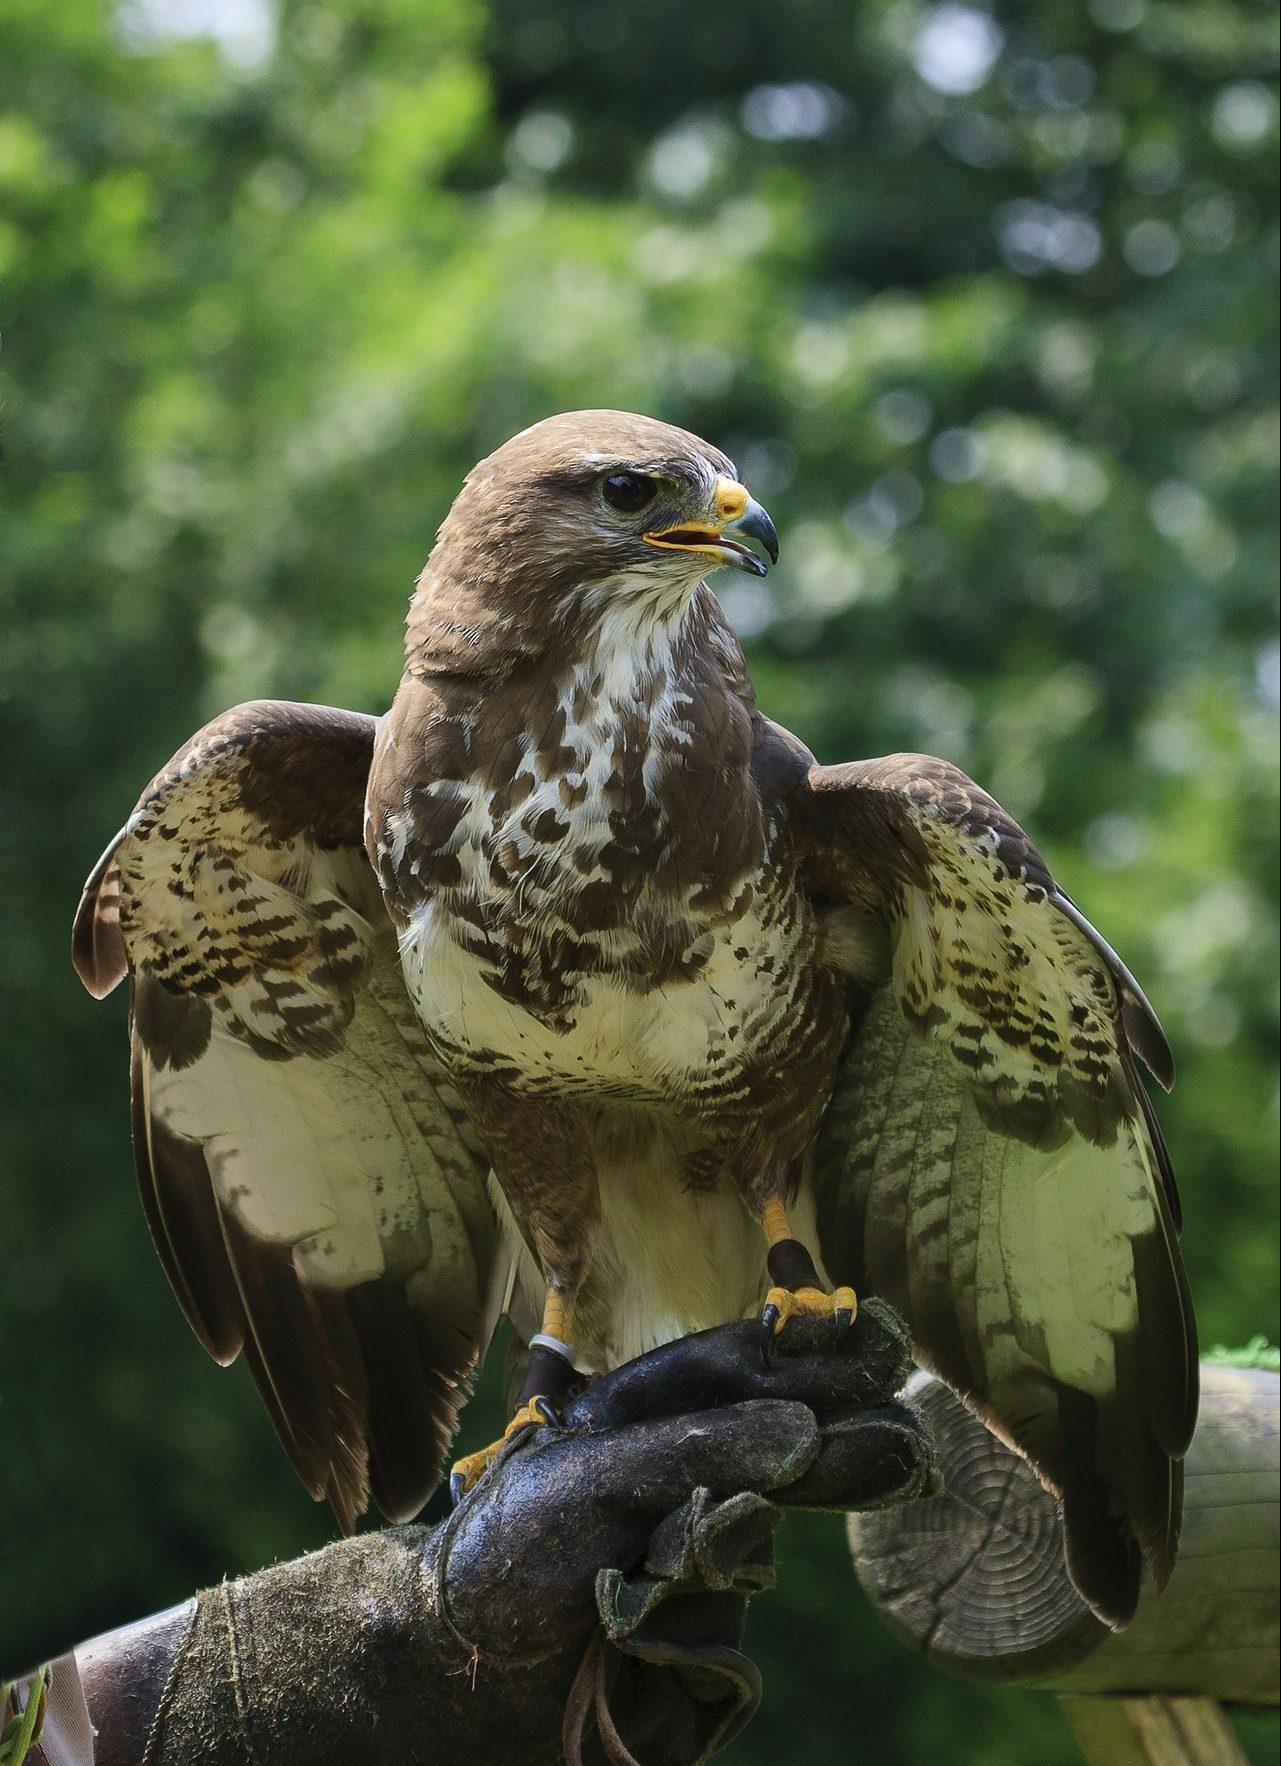 Falconers @ Work - Europese Buizerd